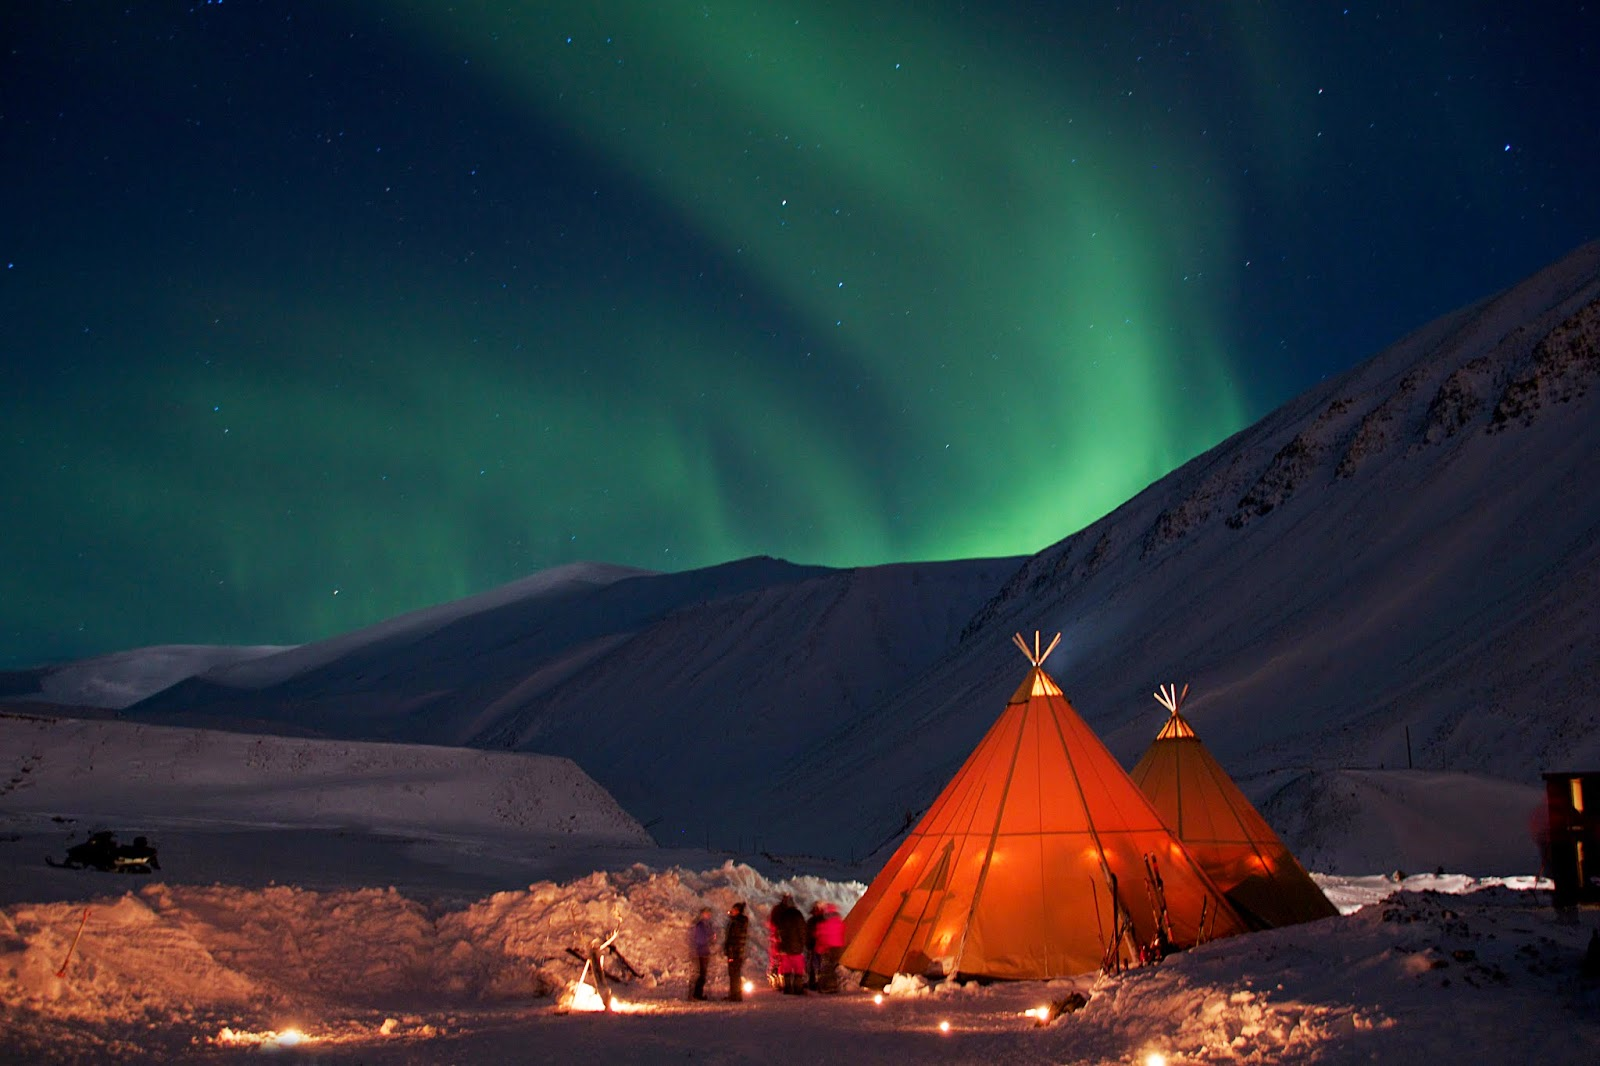 Isole Svalbard, Aurora Boreale - Foto Marcela Cardenas svalbard.net©